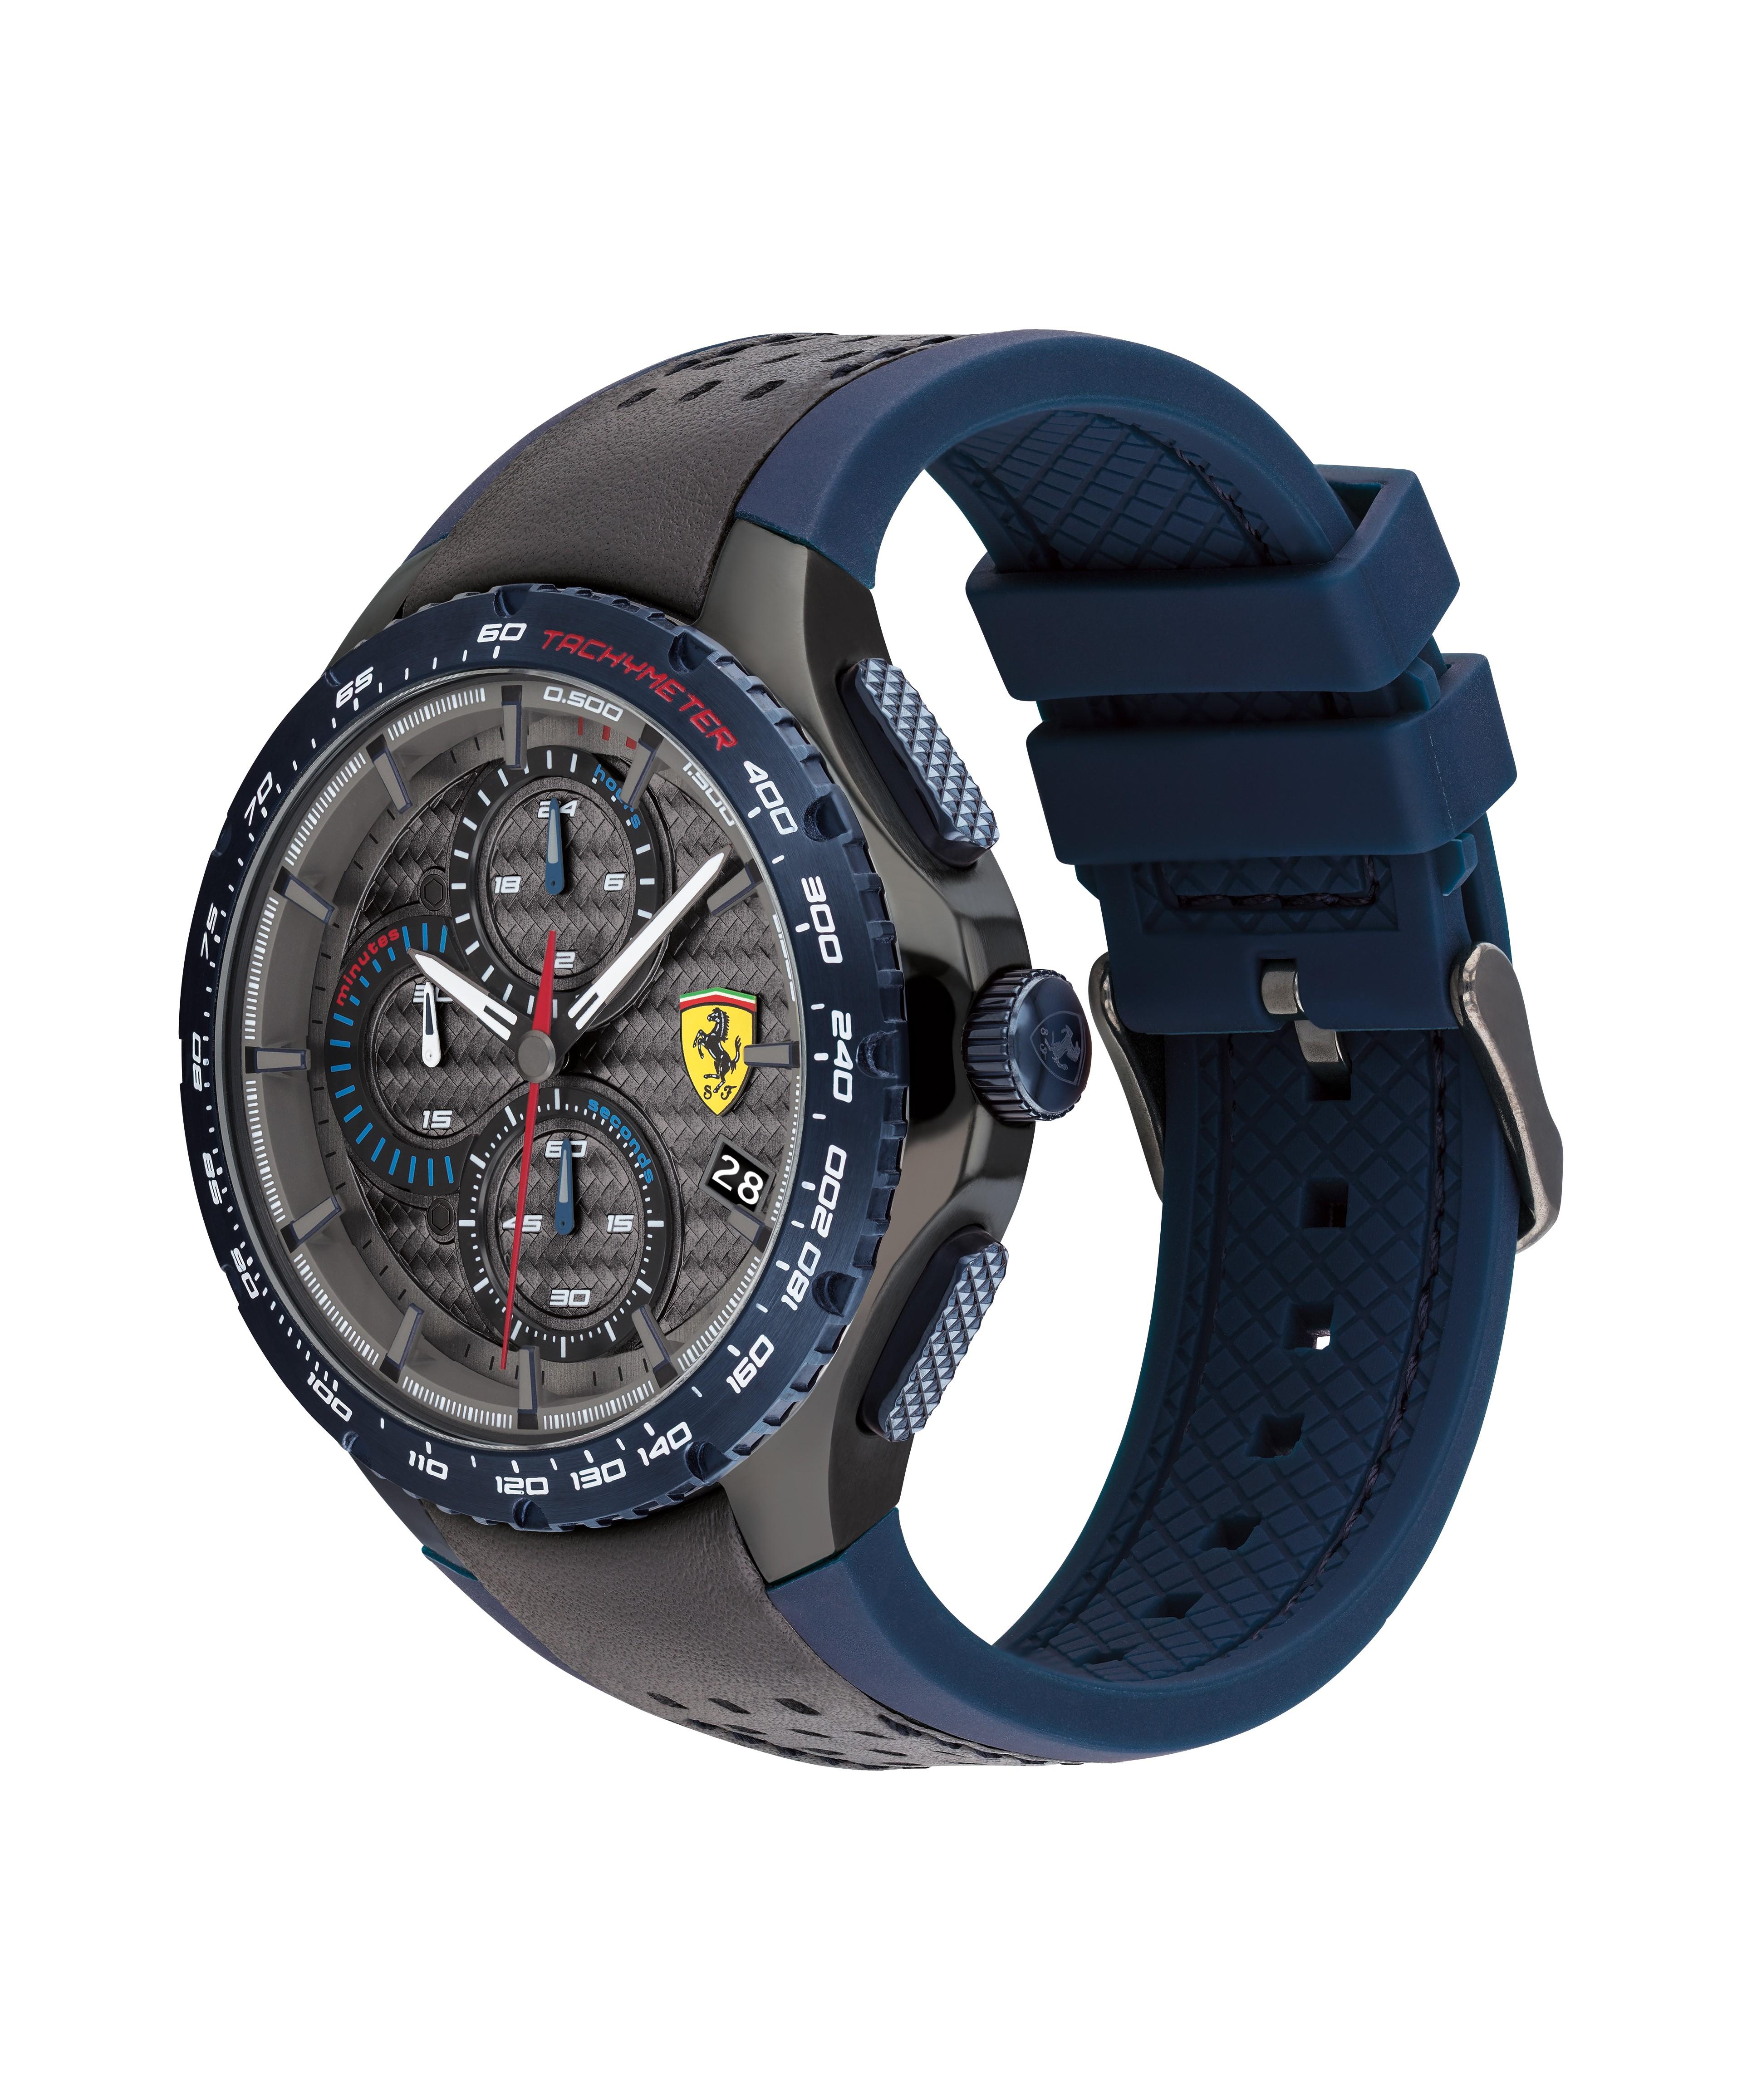 Scuderia Ferrari Pista黑色男士手錶(830734)